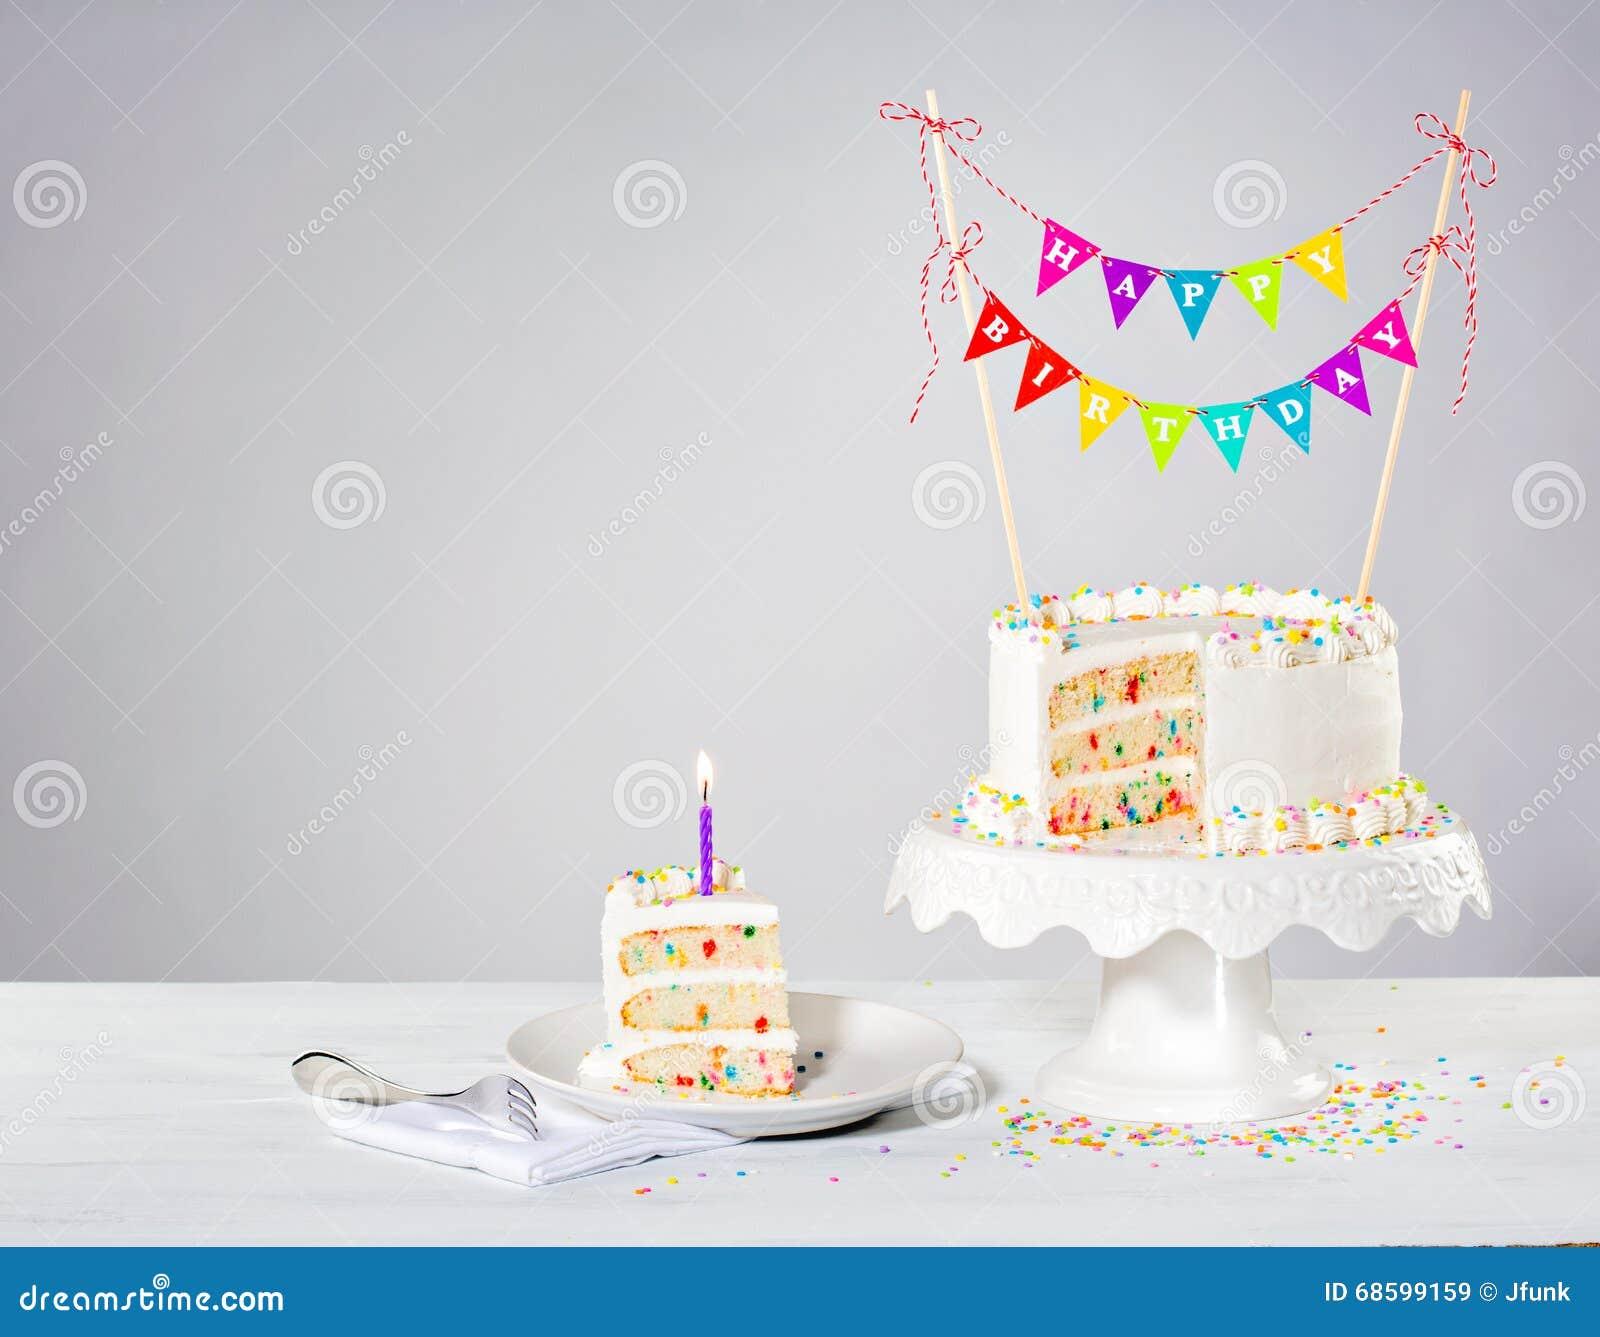 First Birthday Cake Stand